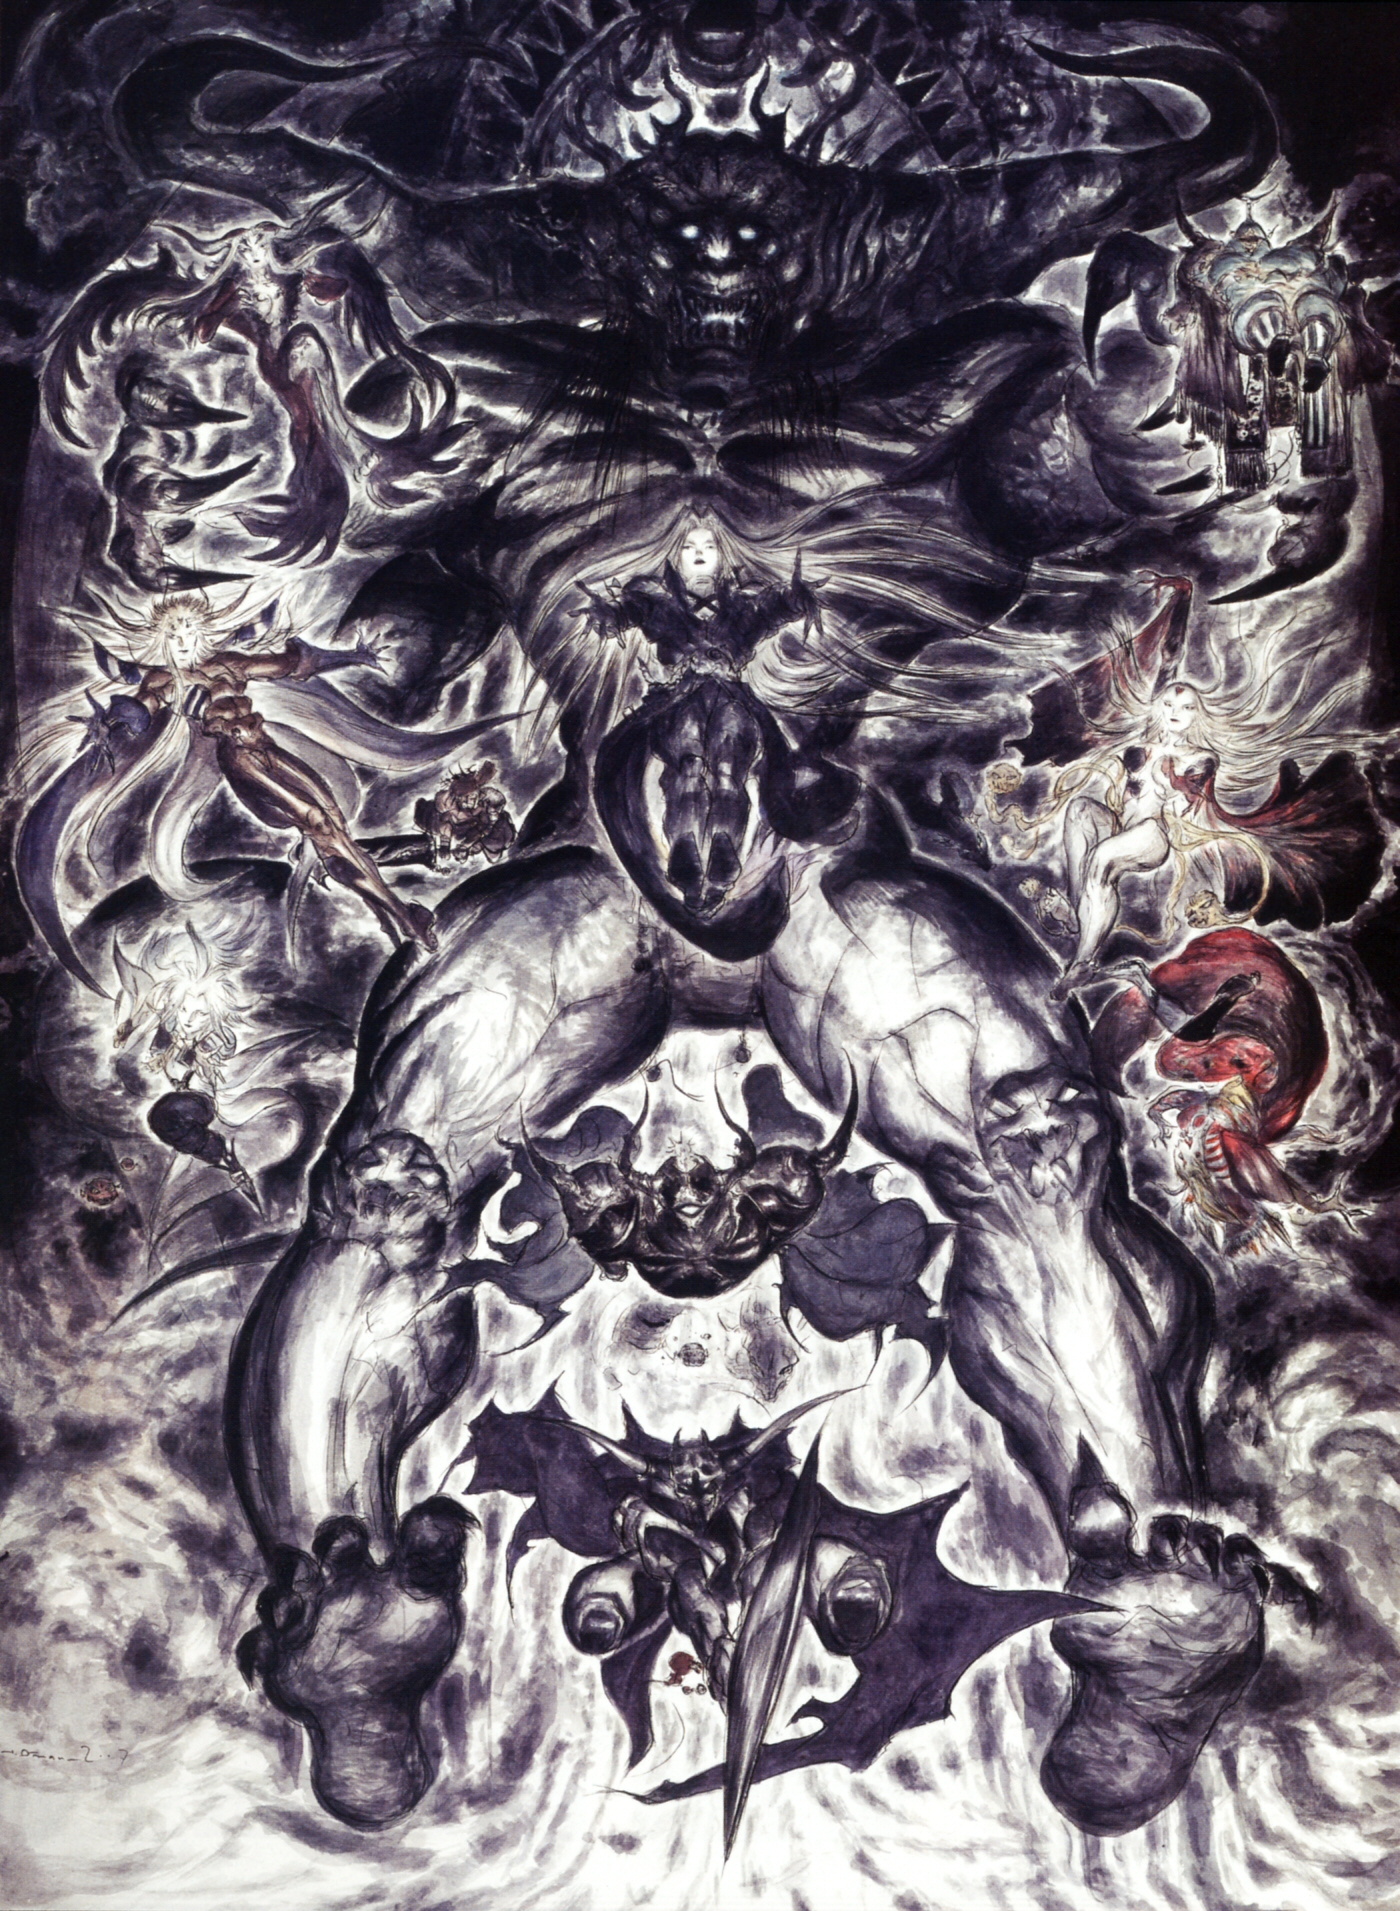 Chaos (Final Fantasy)/Dissidia - The Final Fantasy Wiki - 10 years of ...